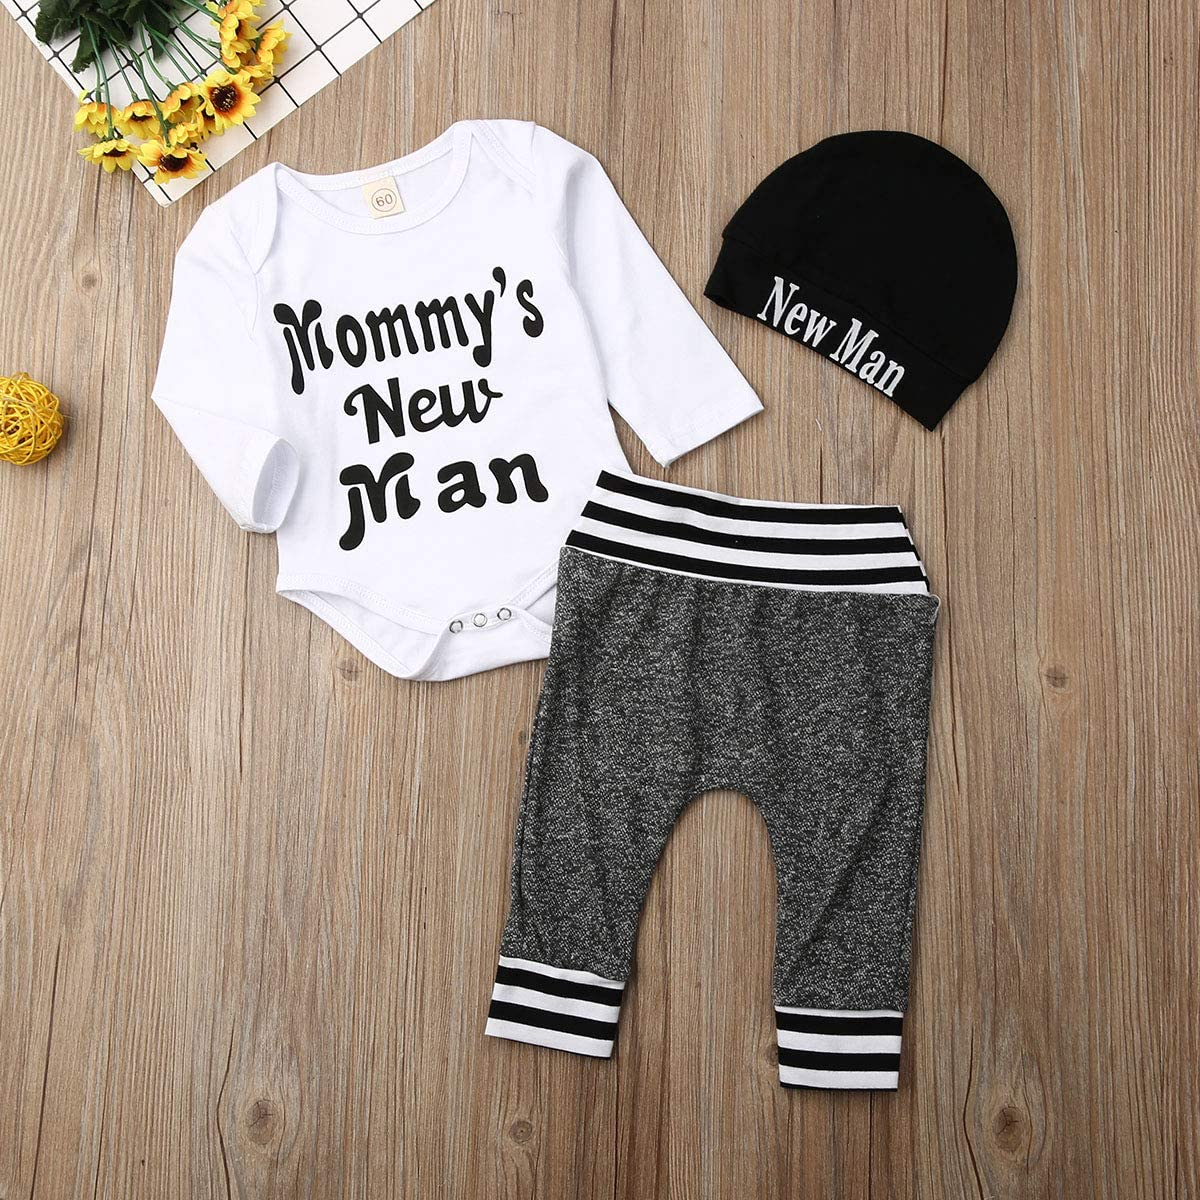 3-teiliges Set lustiges Buchstabenmuster Fiomva Strampler f/ür Neugeborene Lange Hose M/ütze Mommys New Man Oufits Baby Jungen